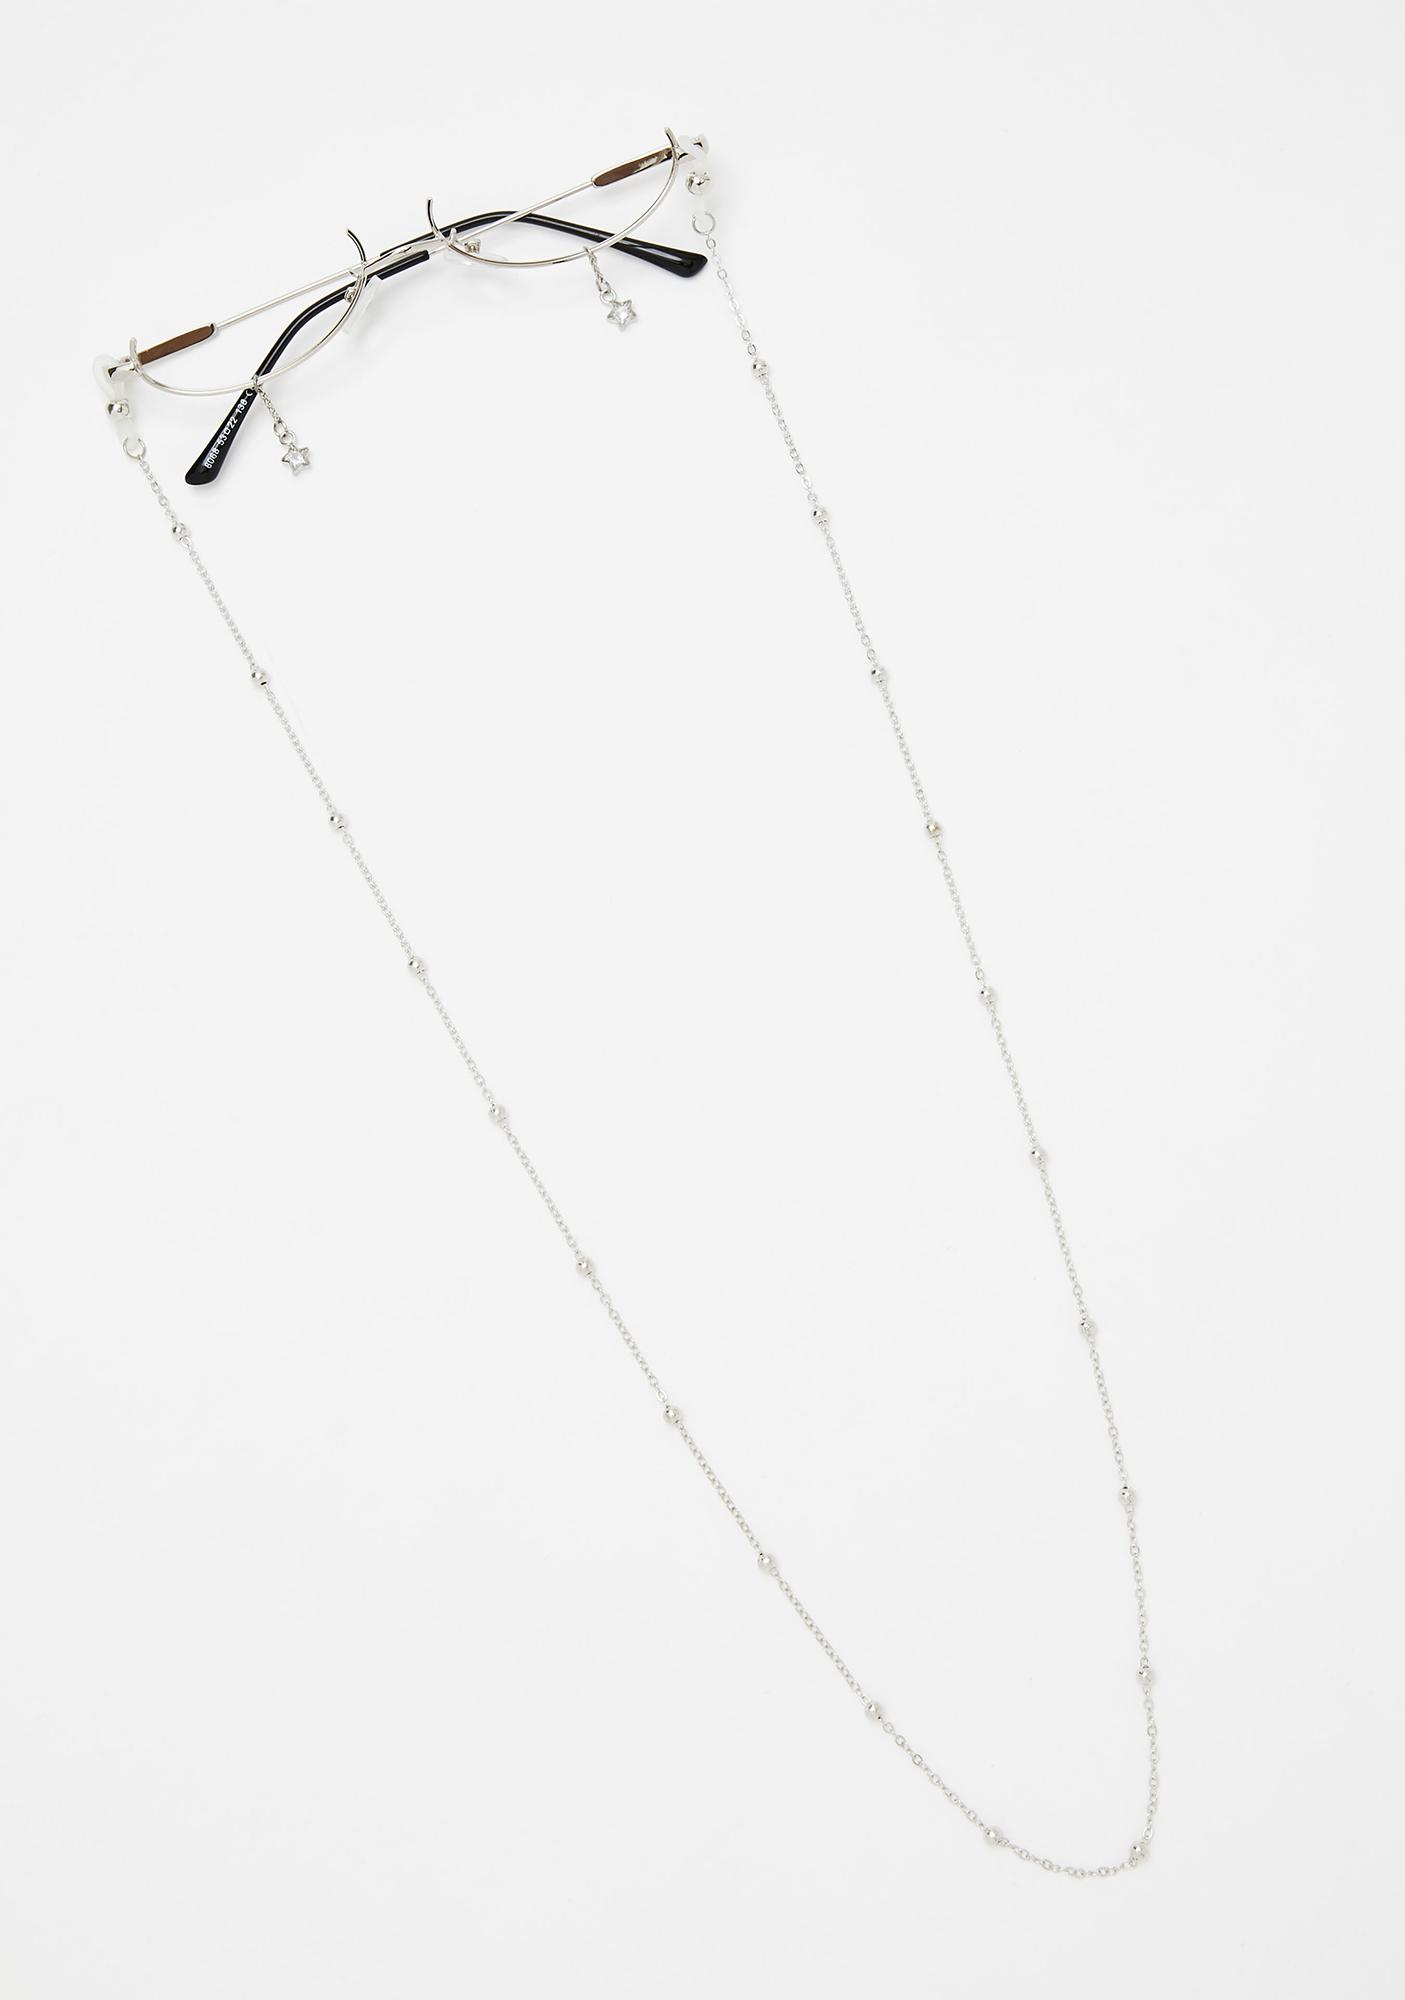 Long Overdue Chain Frames